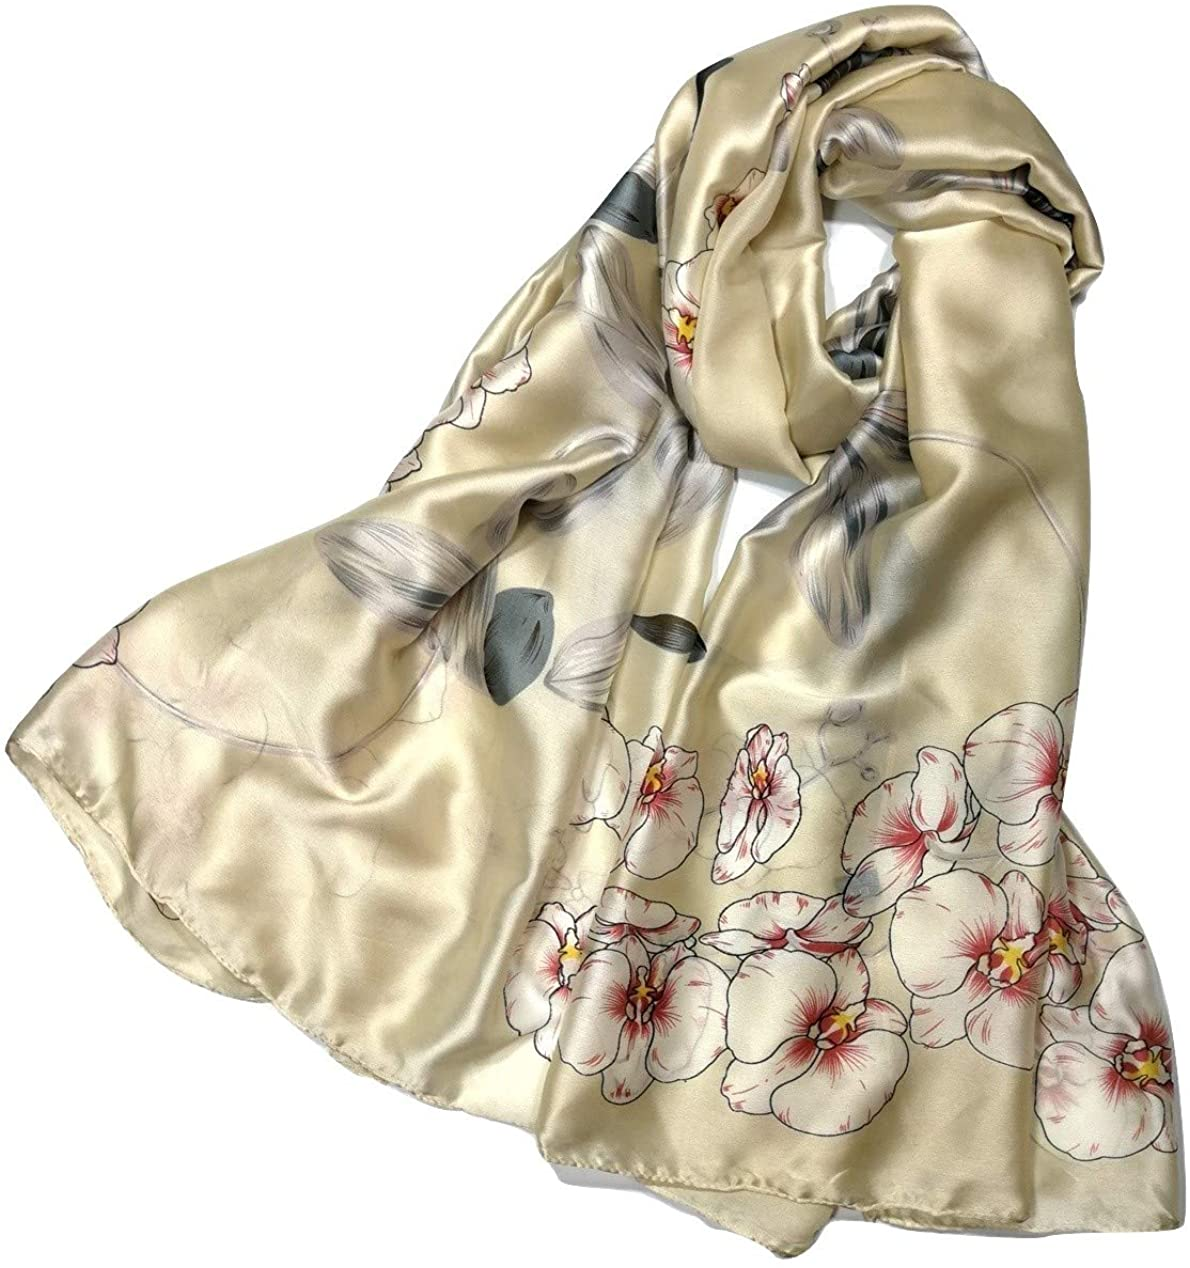 Shanlin Silk Feel Long Floral Satin Scarves for Women in Gift Box